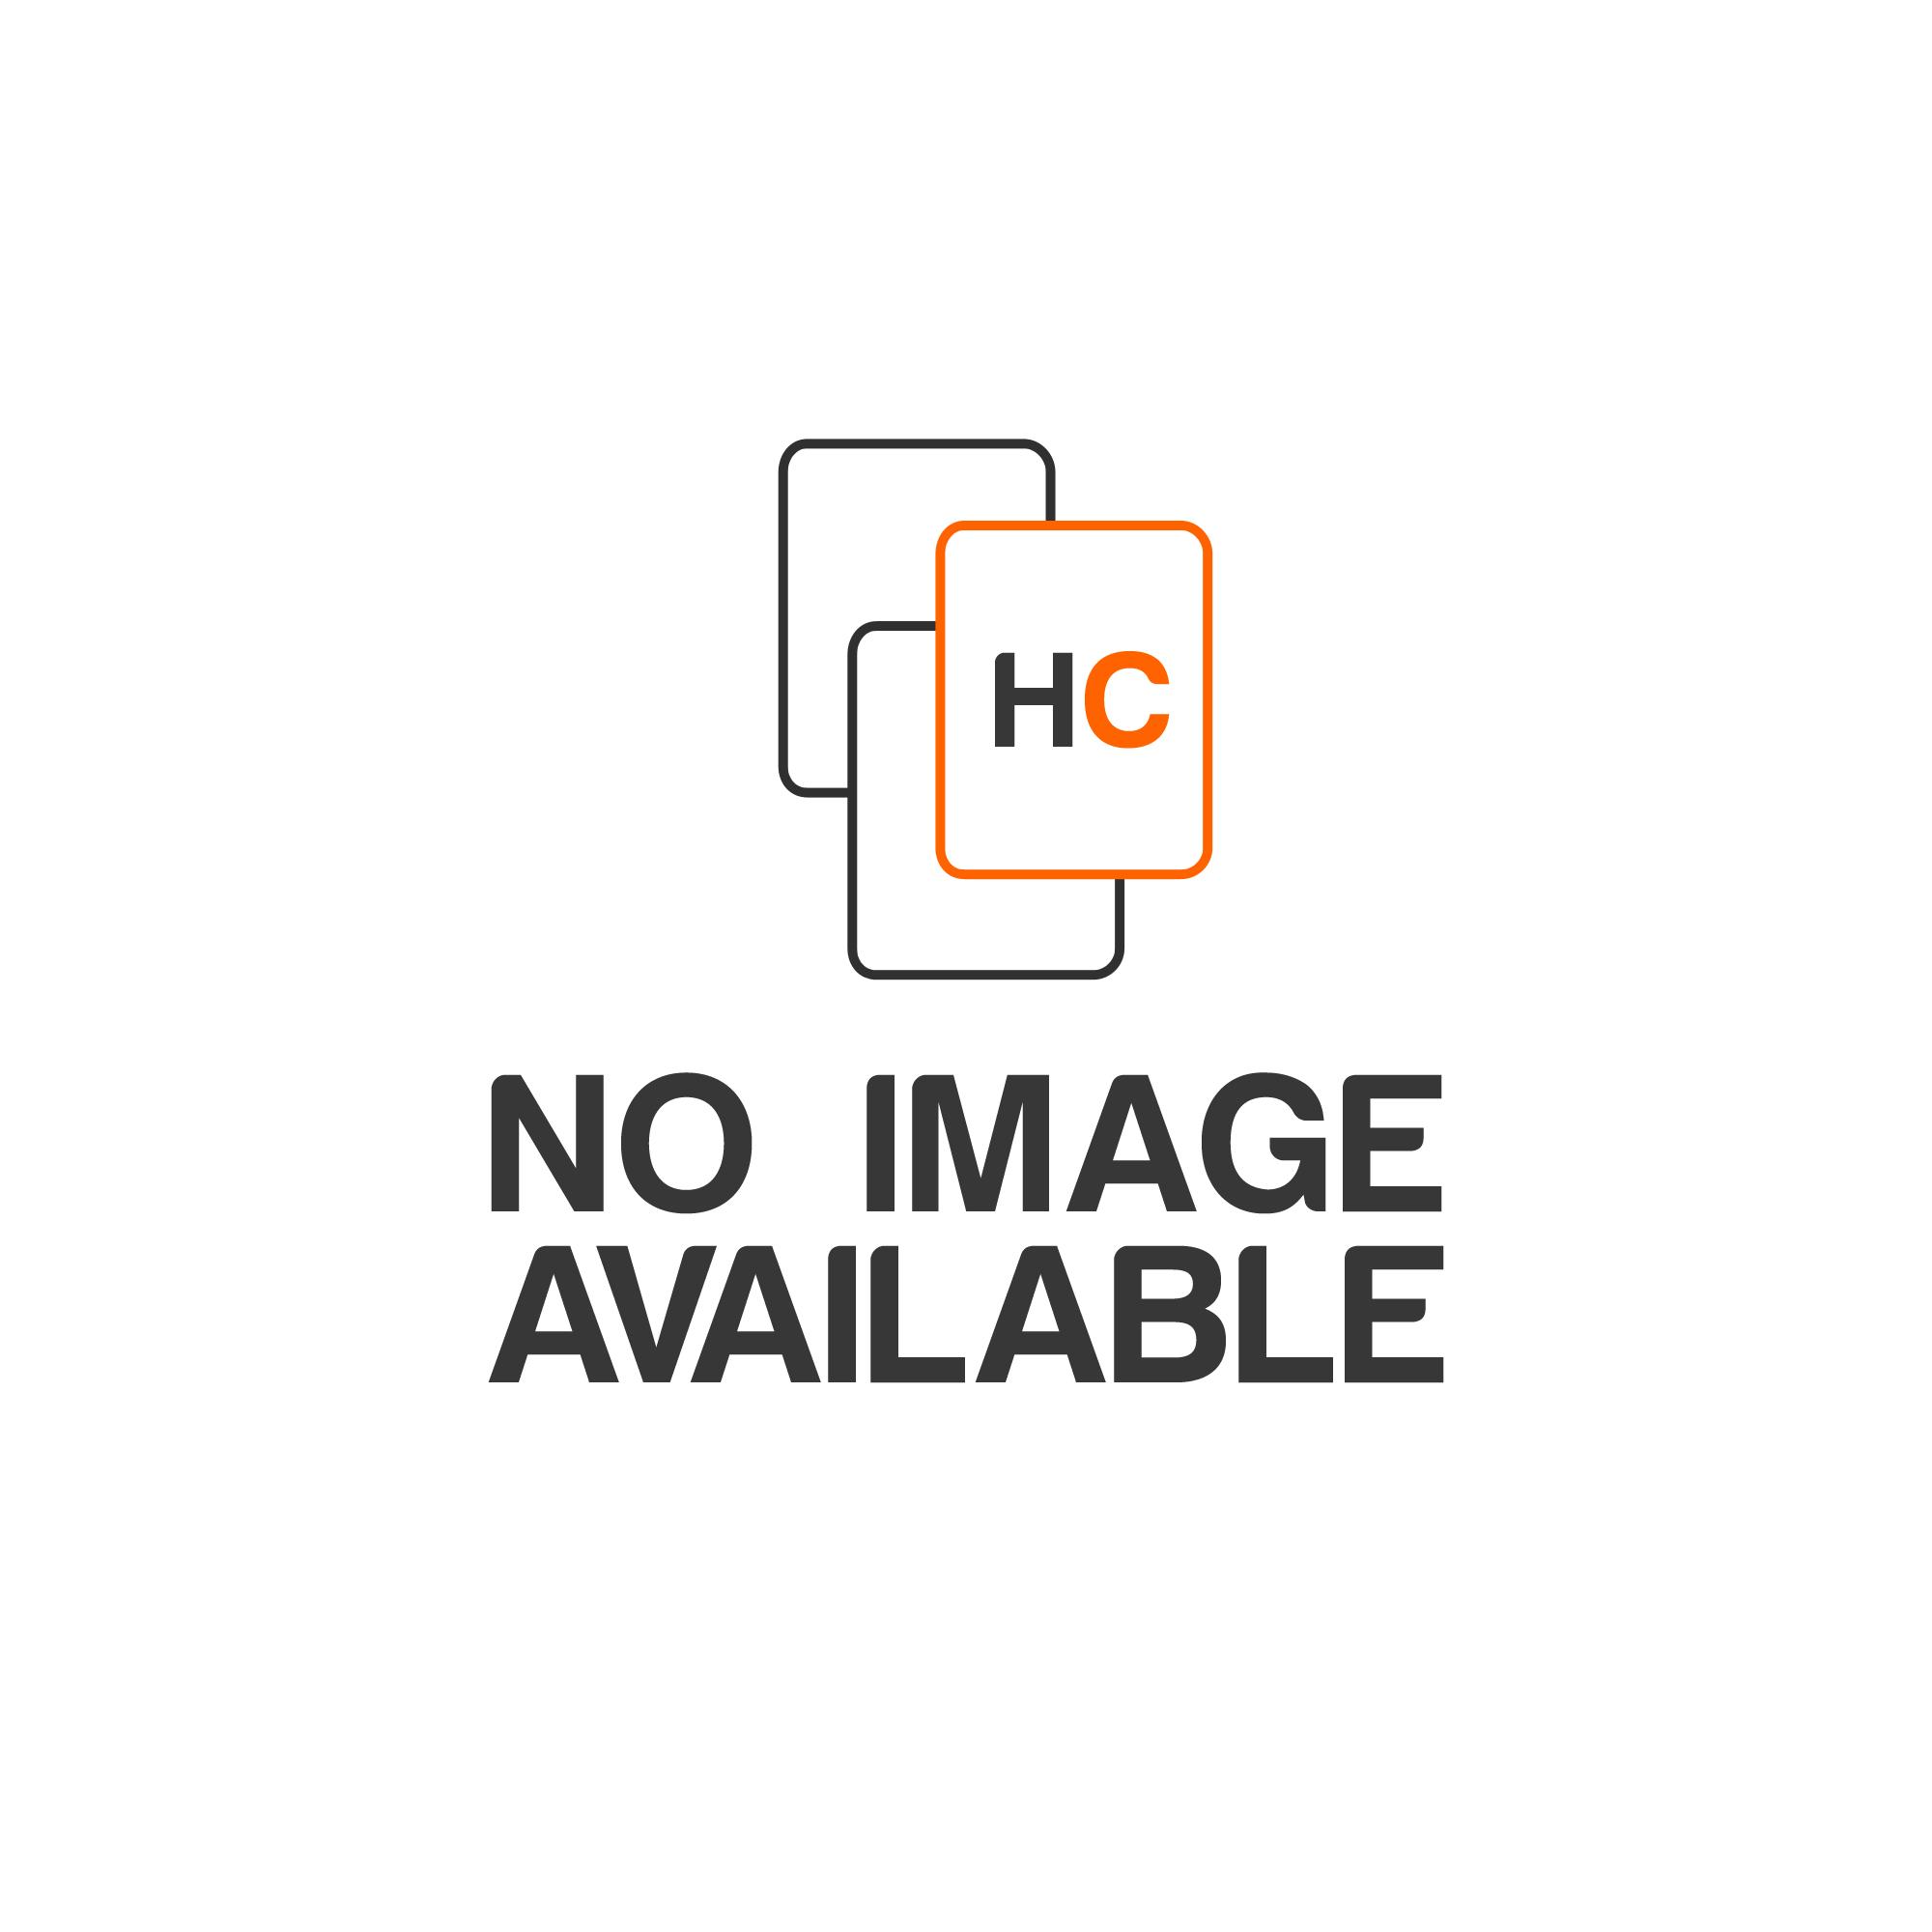 Rare! Pokemon Evolutions Arcanine Reverse Holo